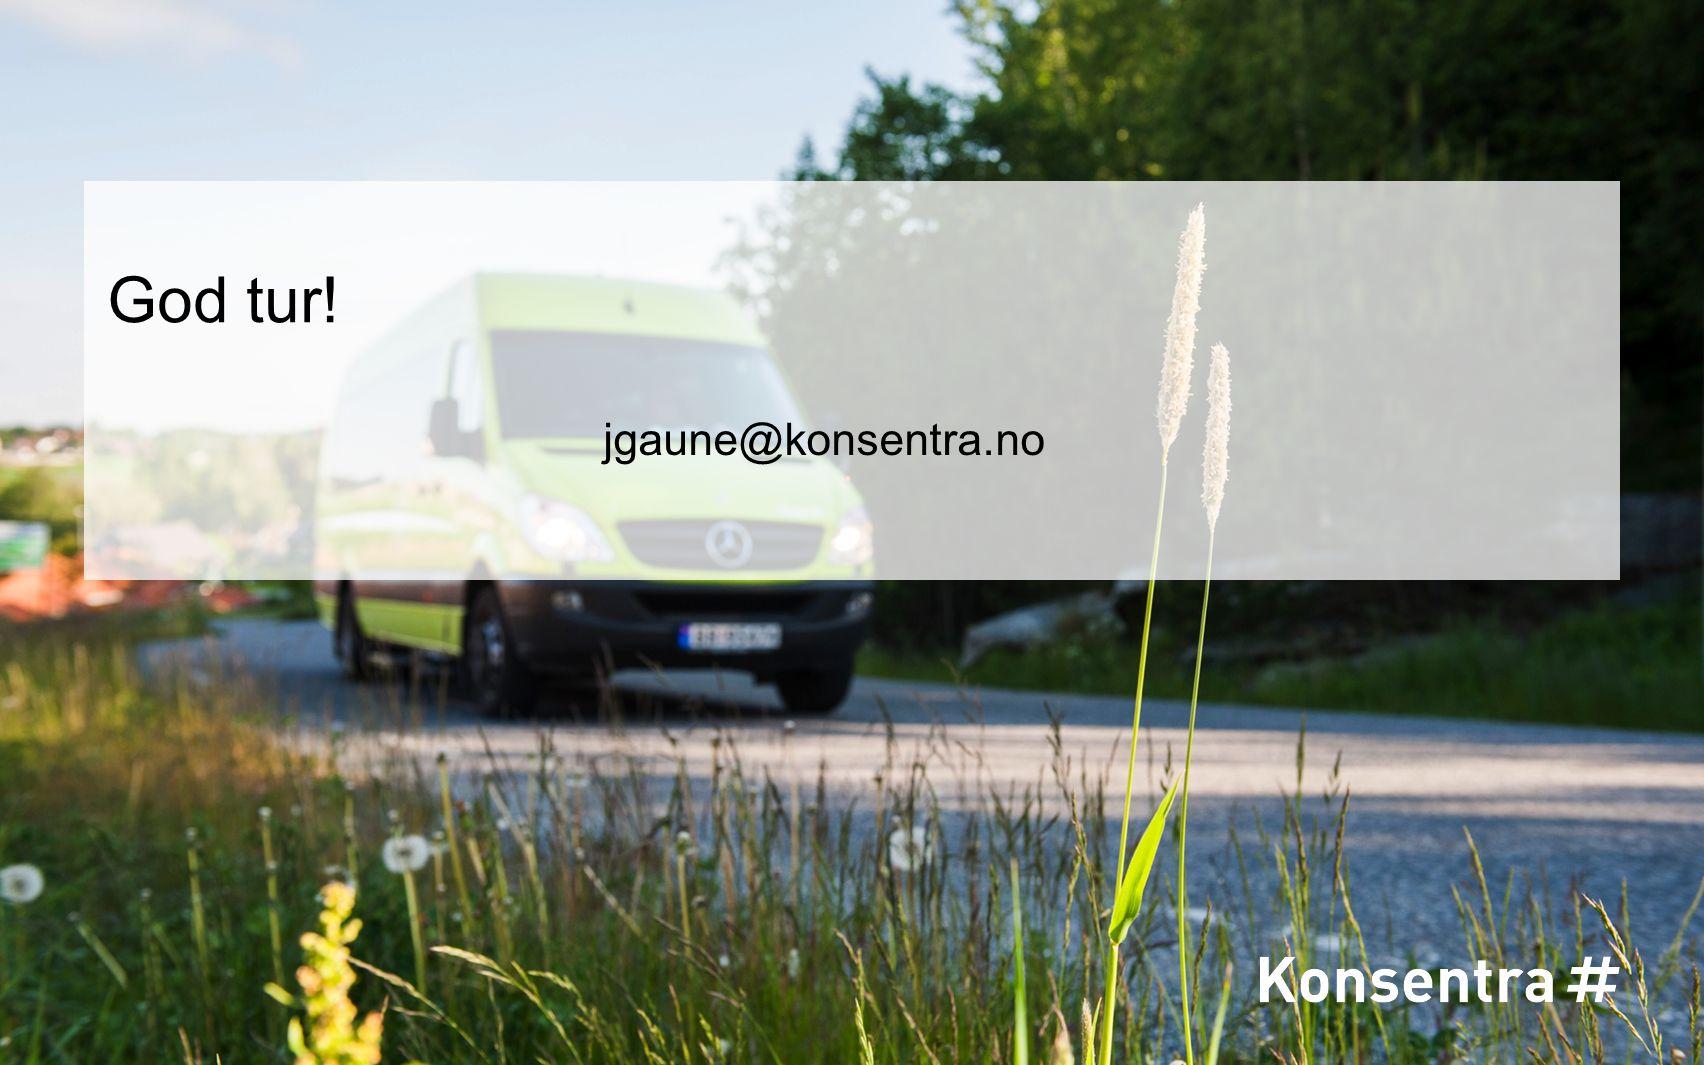 God tur! jgaune@konsentra.no